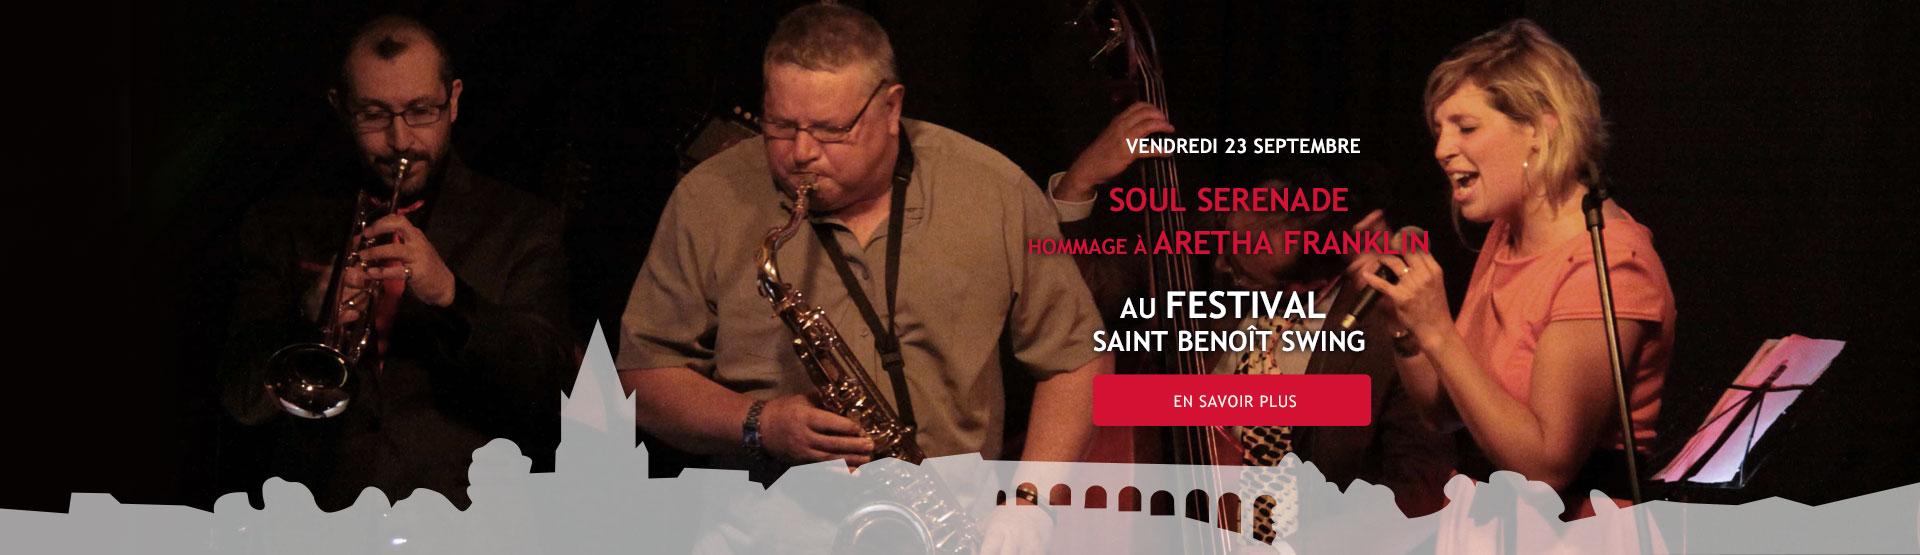 slide3-soul-serenade